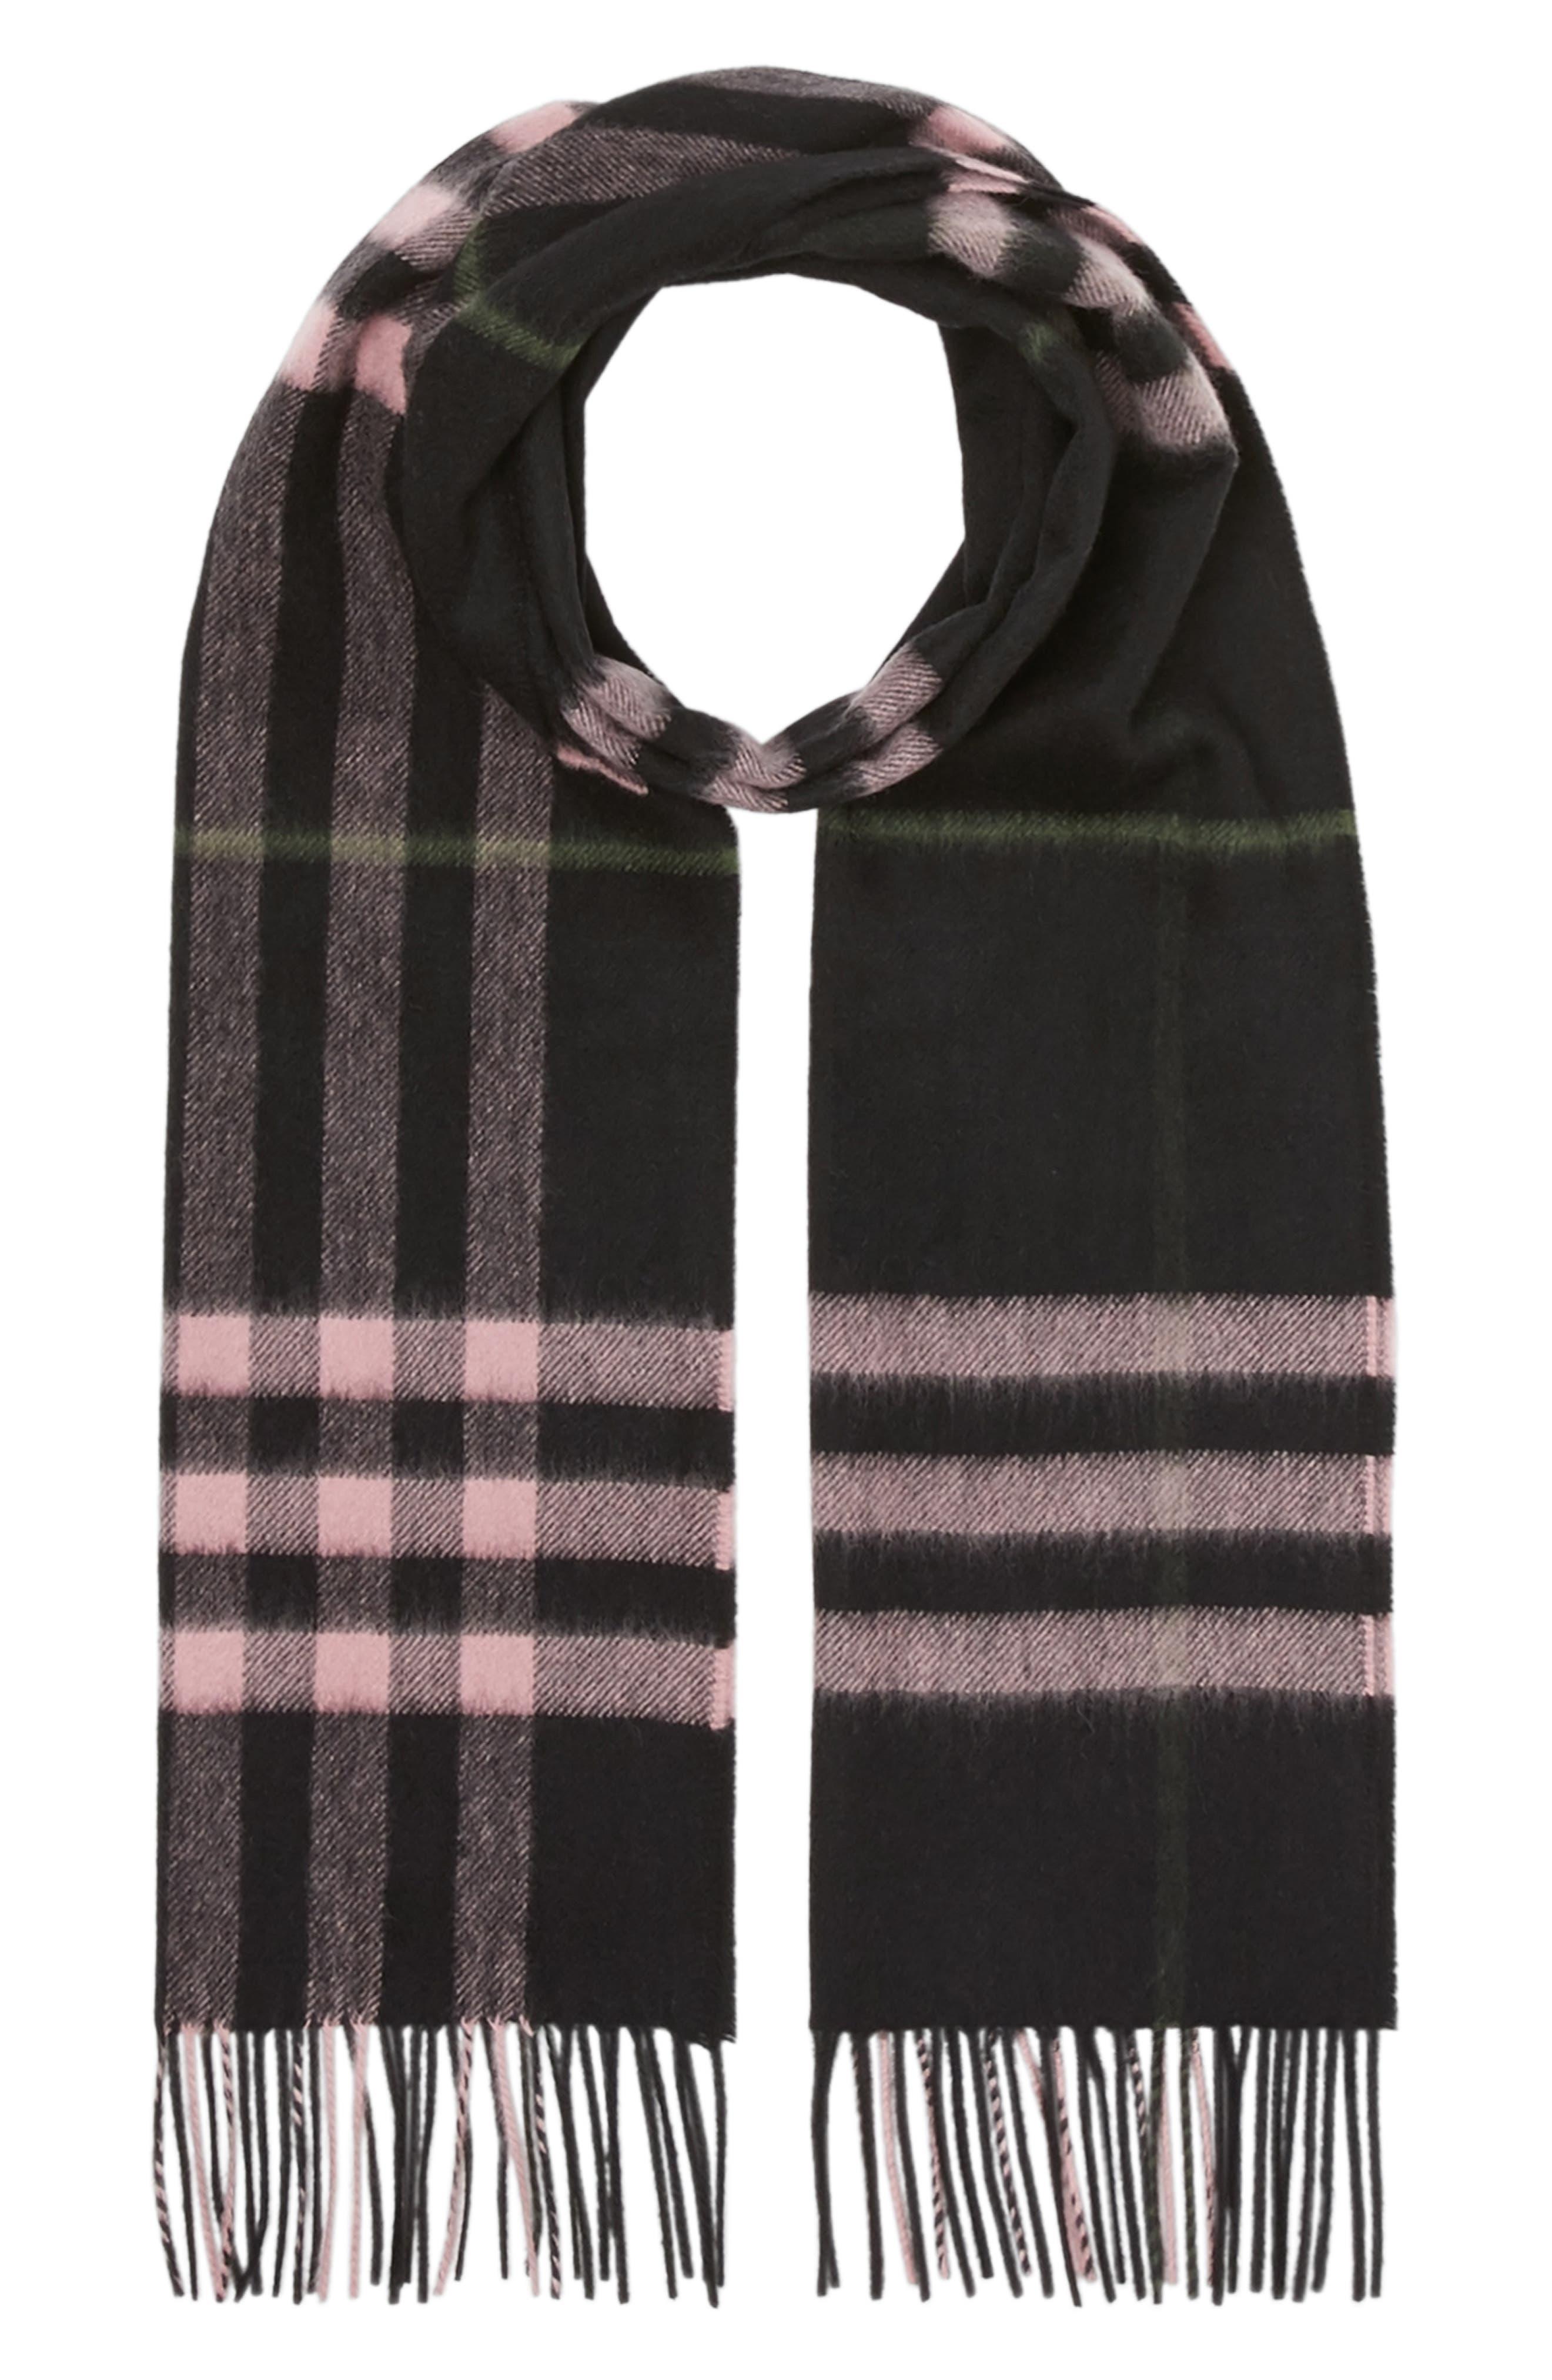 Scarf for Women Flag Scarf Shawl Wrap Long Neck Scarf PSWJ01